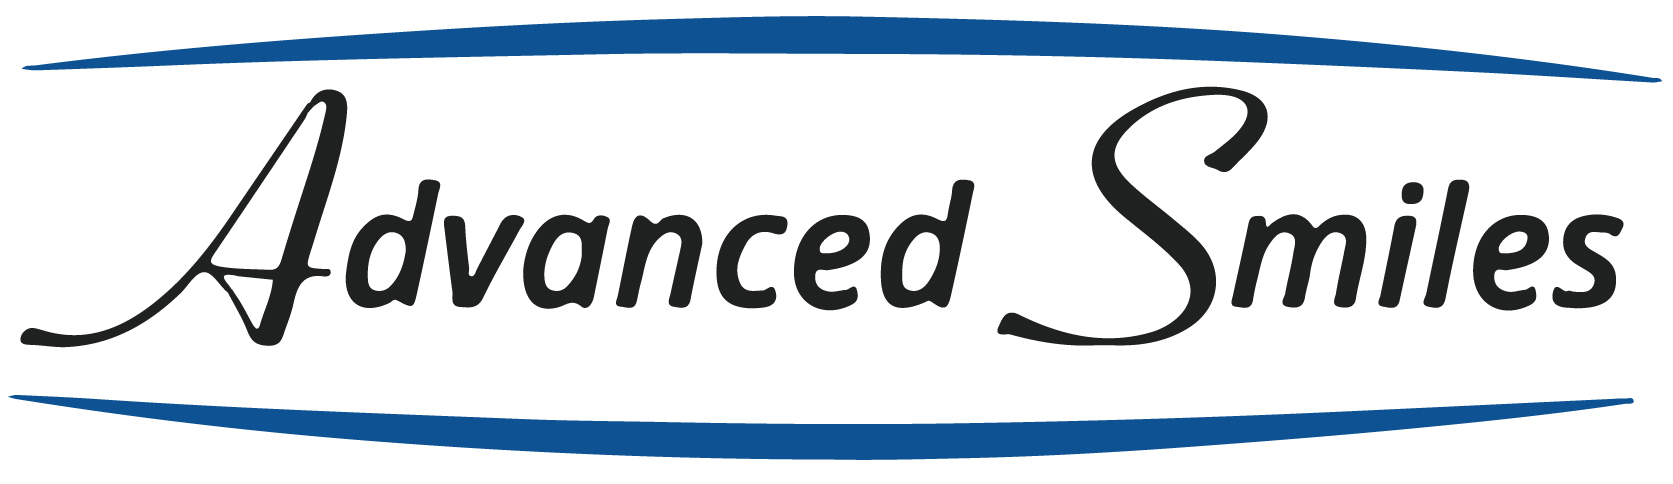 logo-1-01.jpg